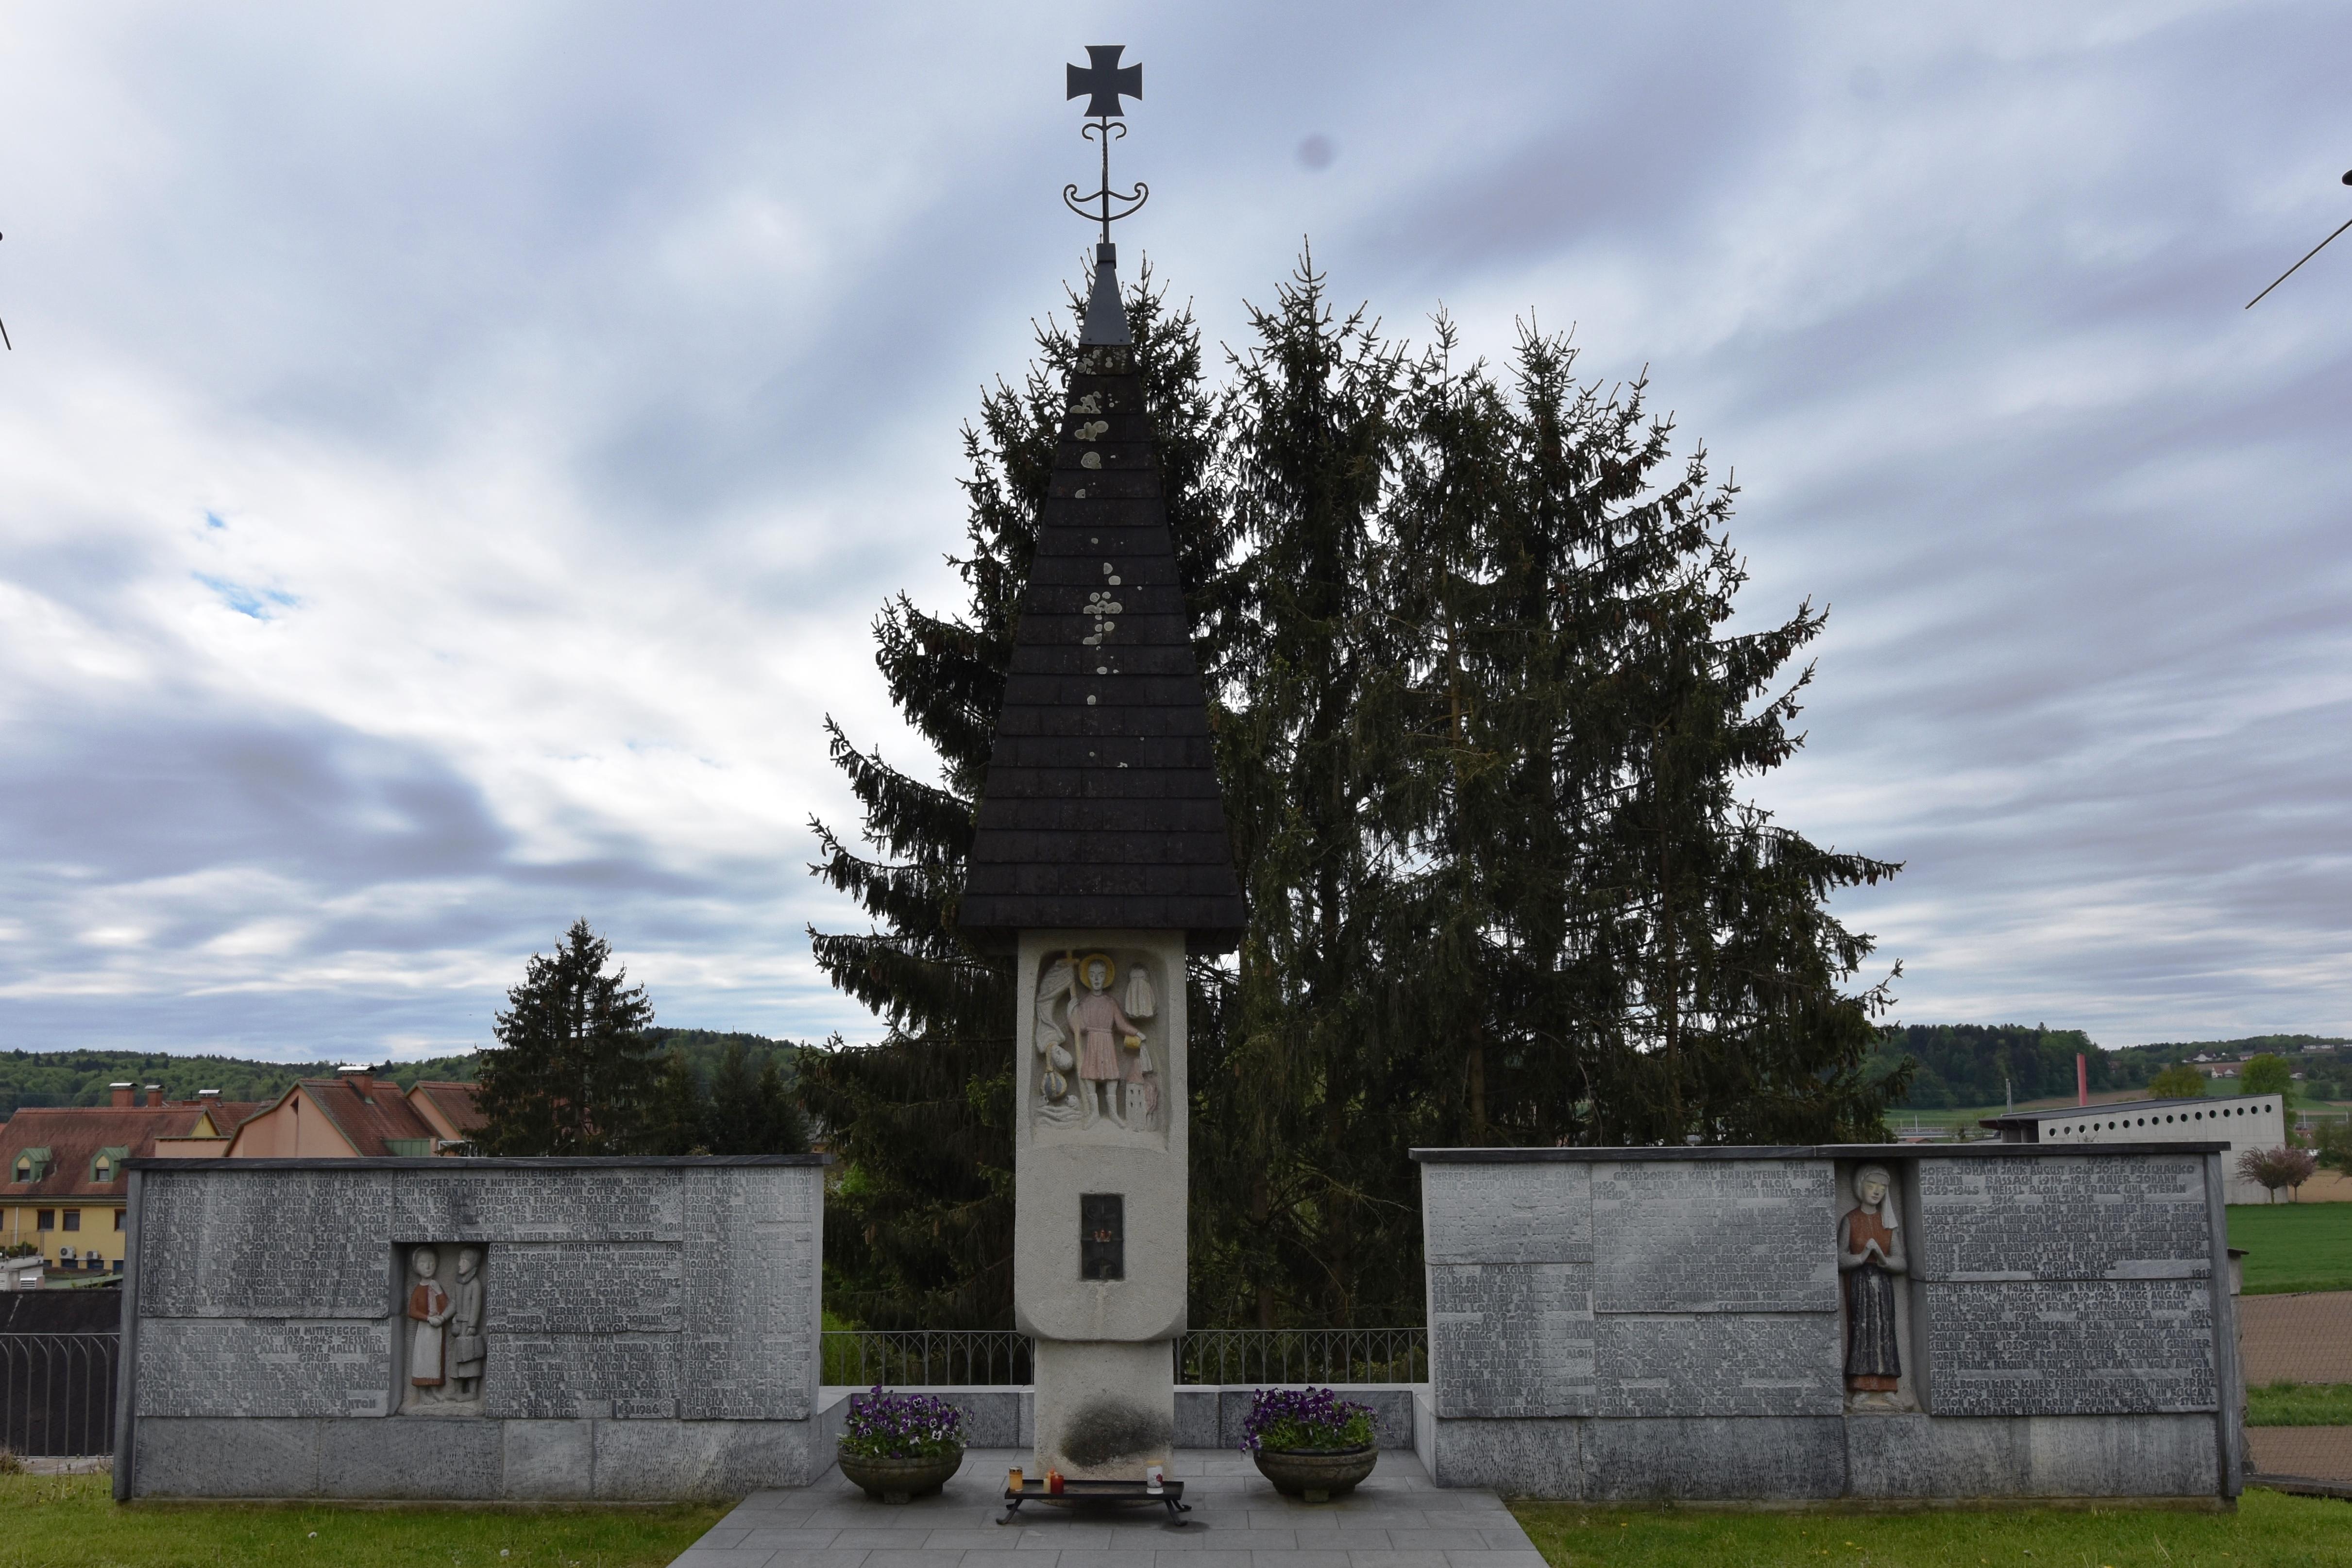 Partnersuche online in pchlarn - Sankt gallenkirch single flirt